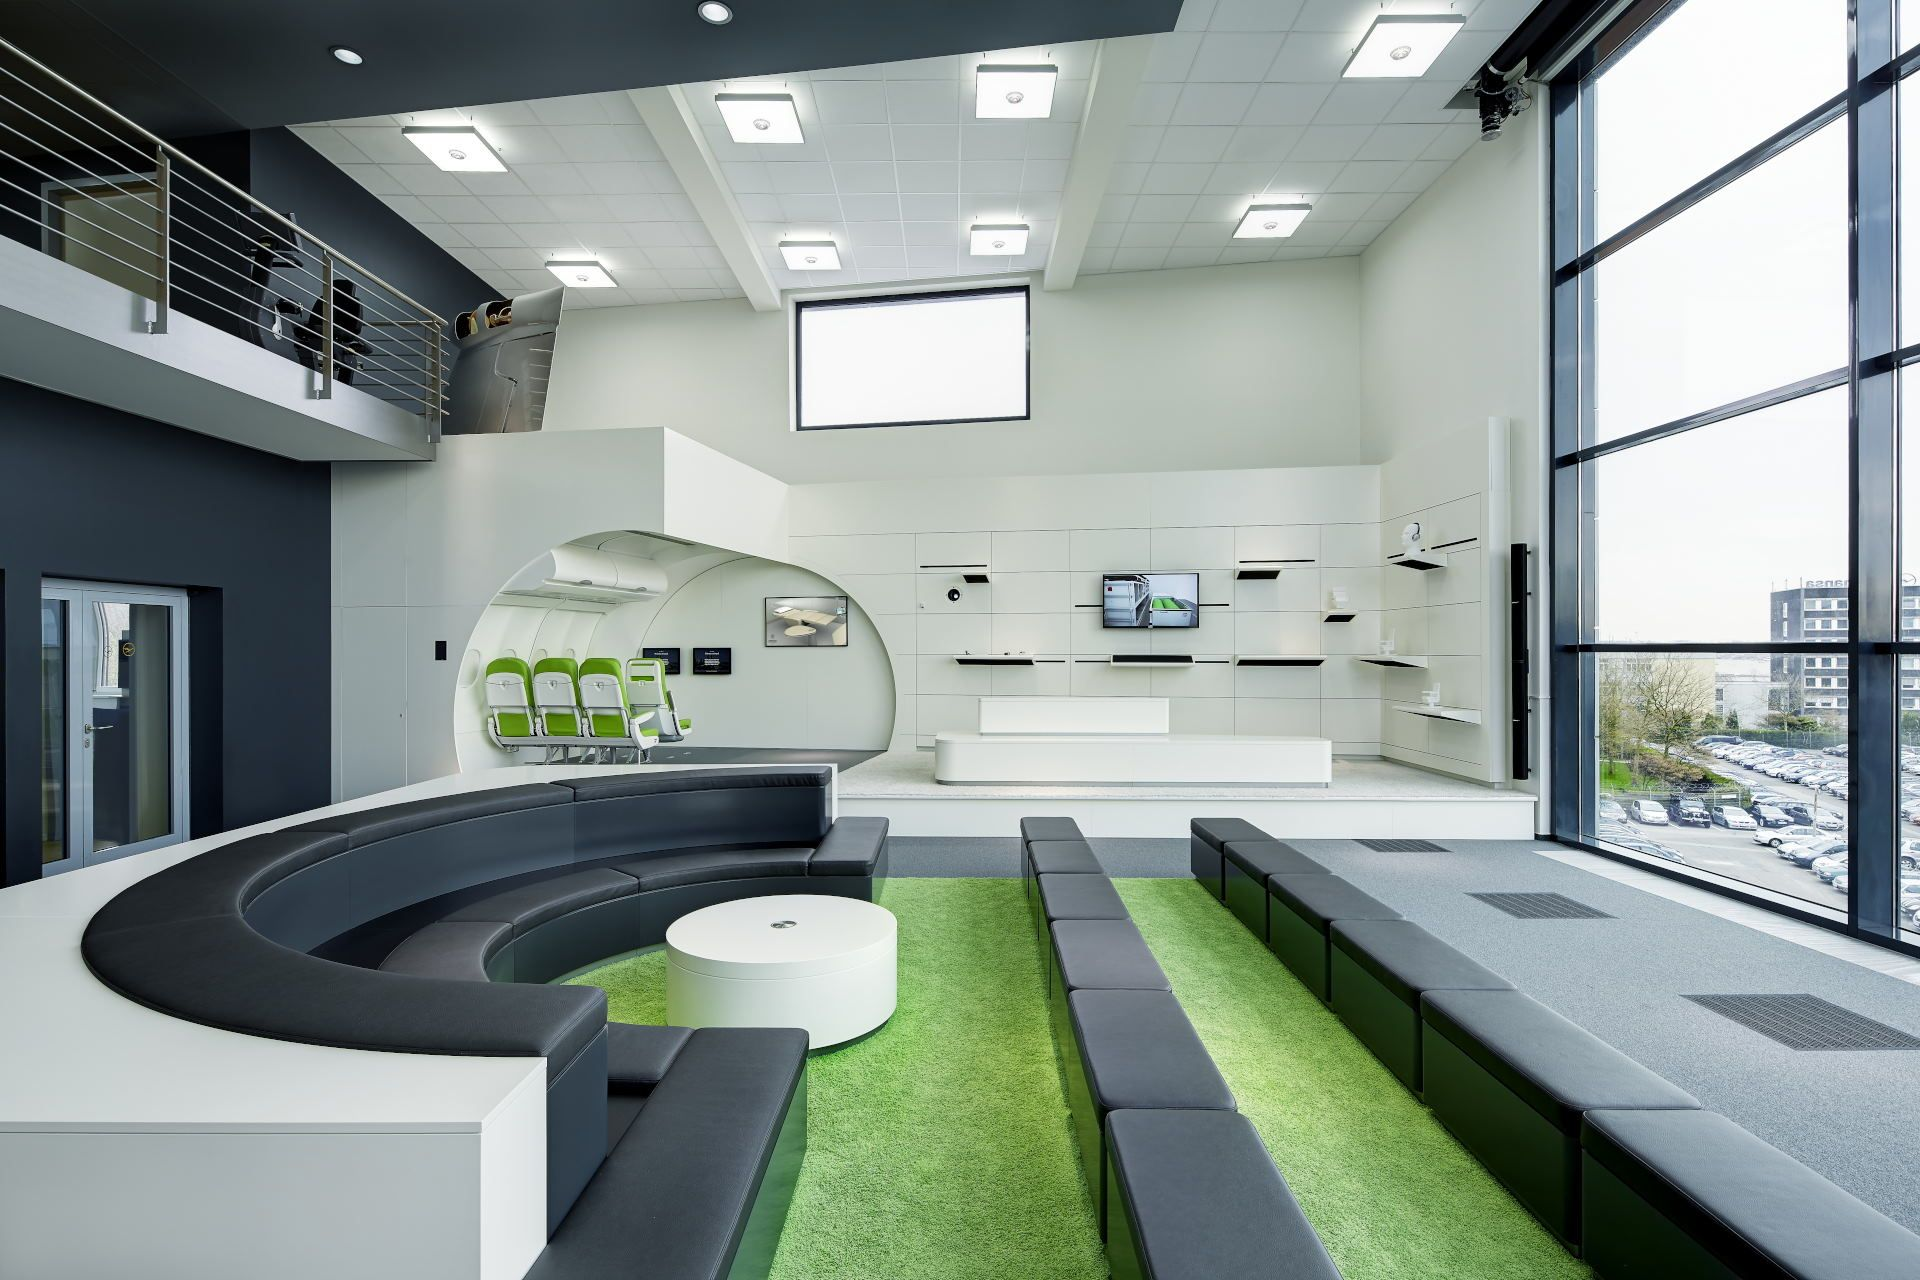 Innenarchitekt Hamburg showroom design lufthansa technik hamburg by ulla götz